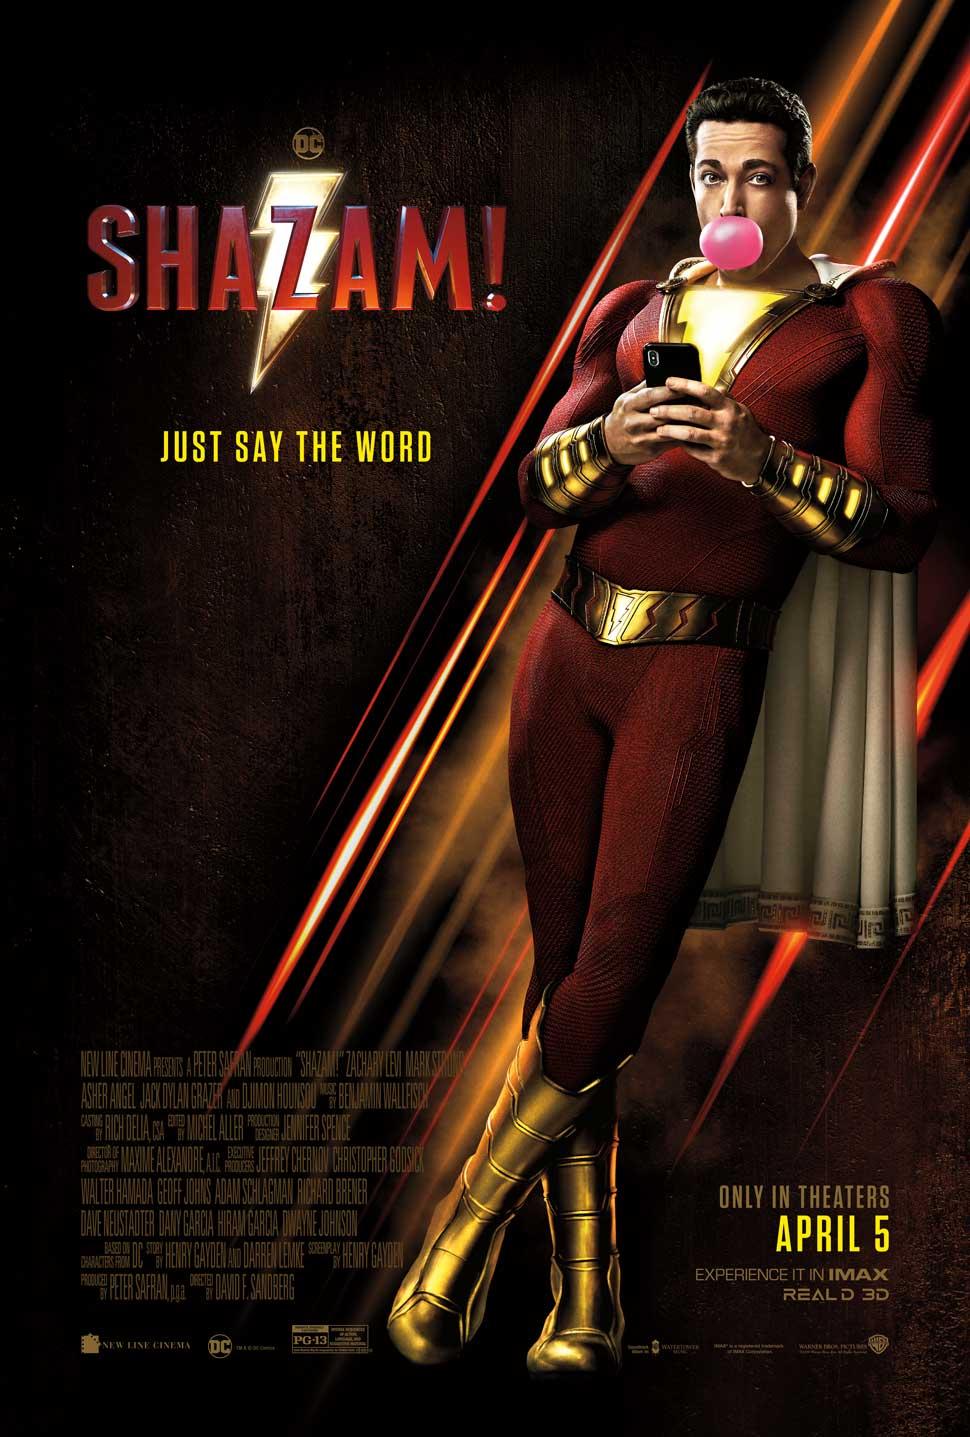 Shazam! Cover